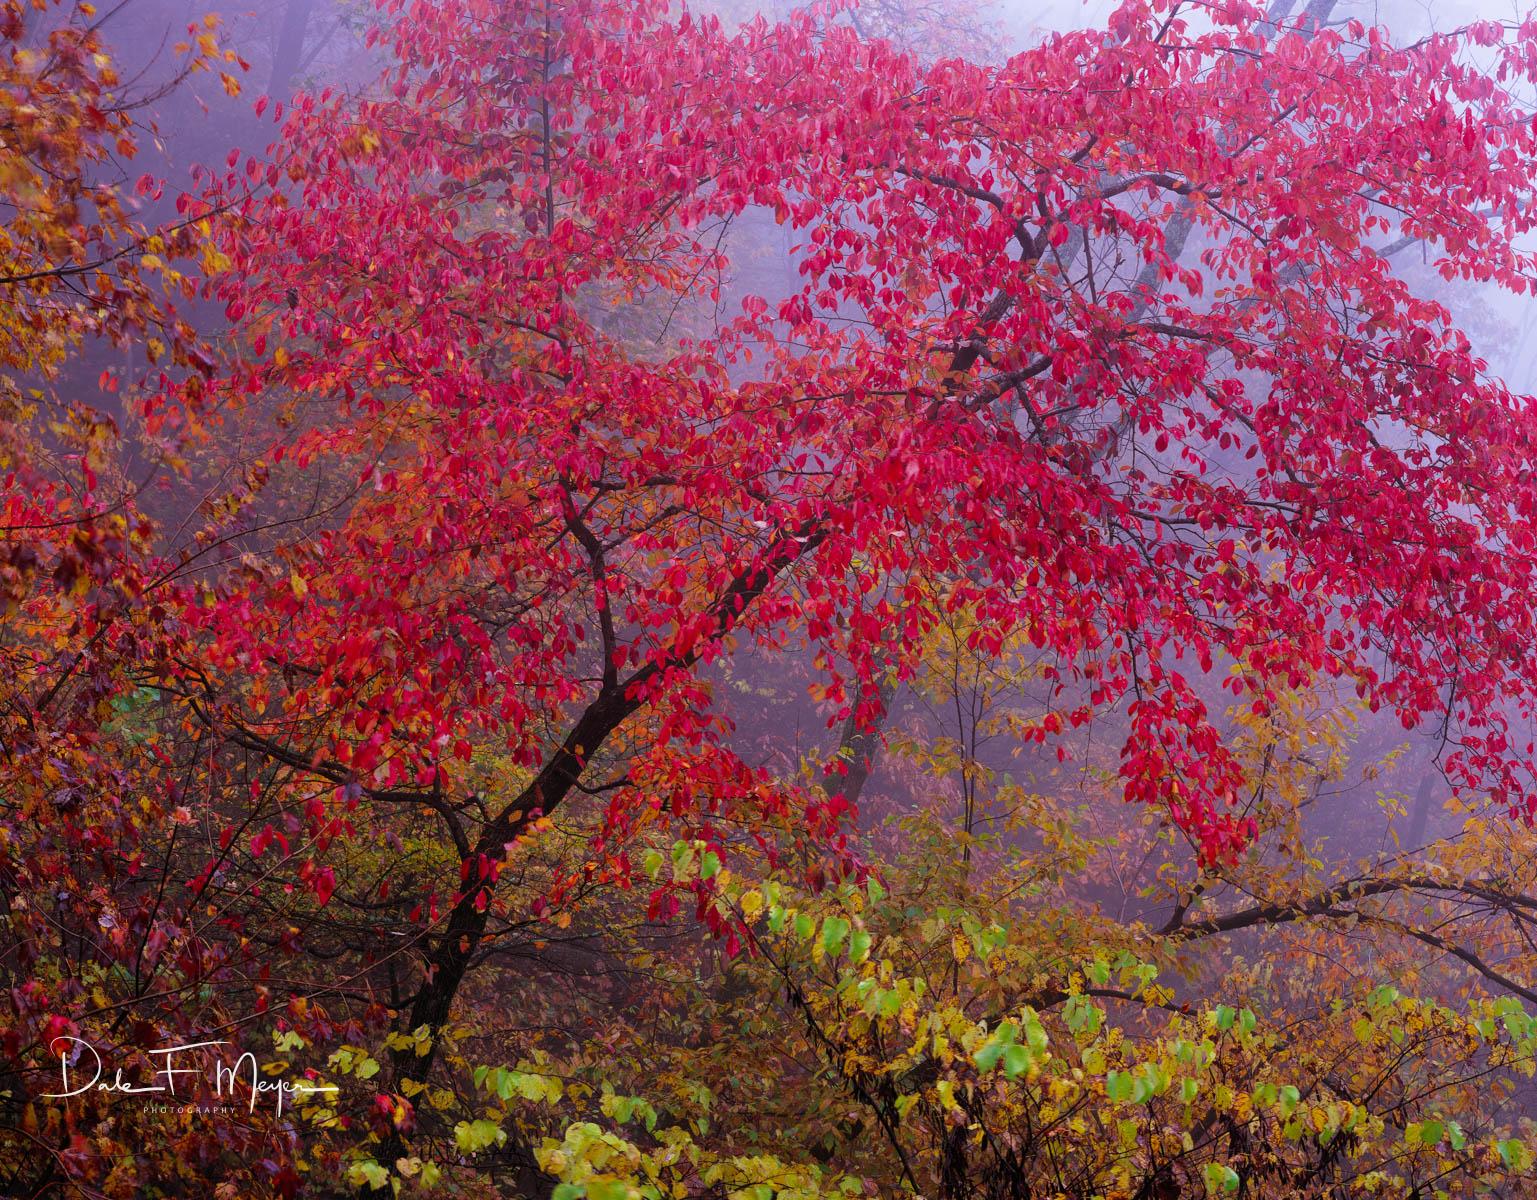 4X5 Fuji 50 Slide Film,Gum Tree,North Arkansas,Ozark National Forrest,fall,fog, photo